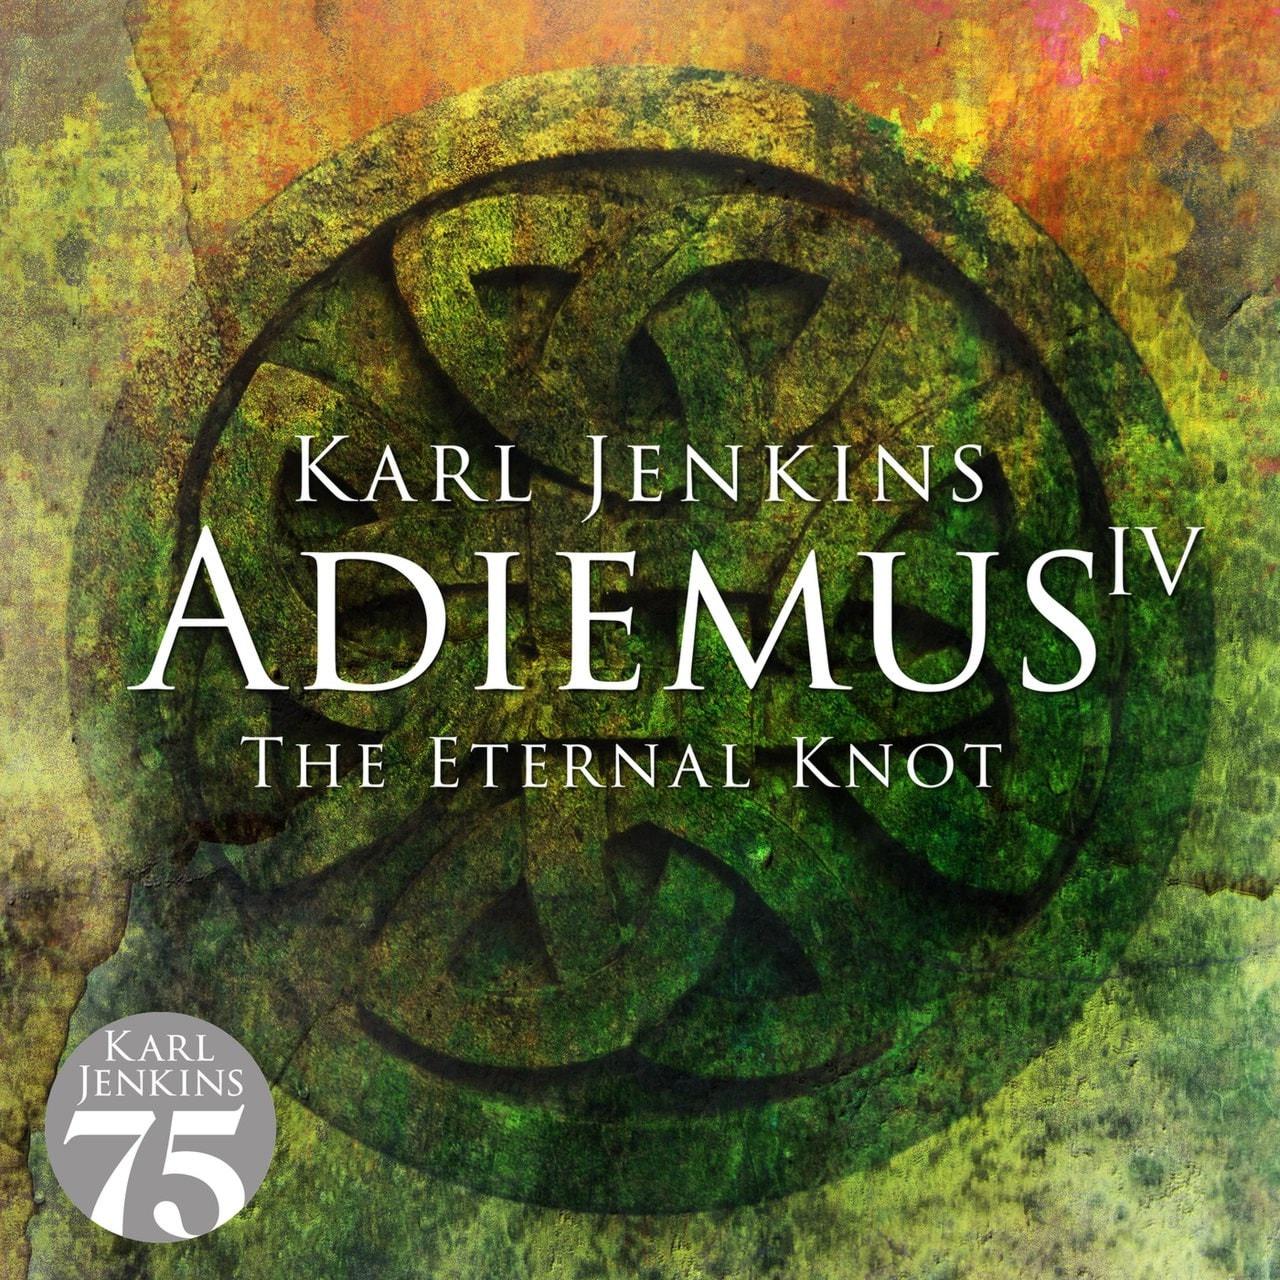 Karl Jenkins: Adiemus IV - The Eternal Knot - 1